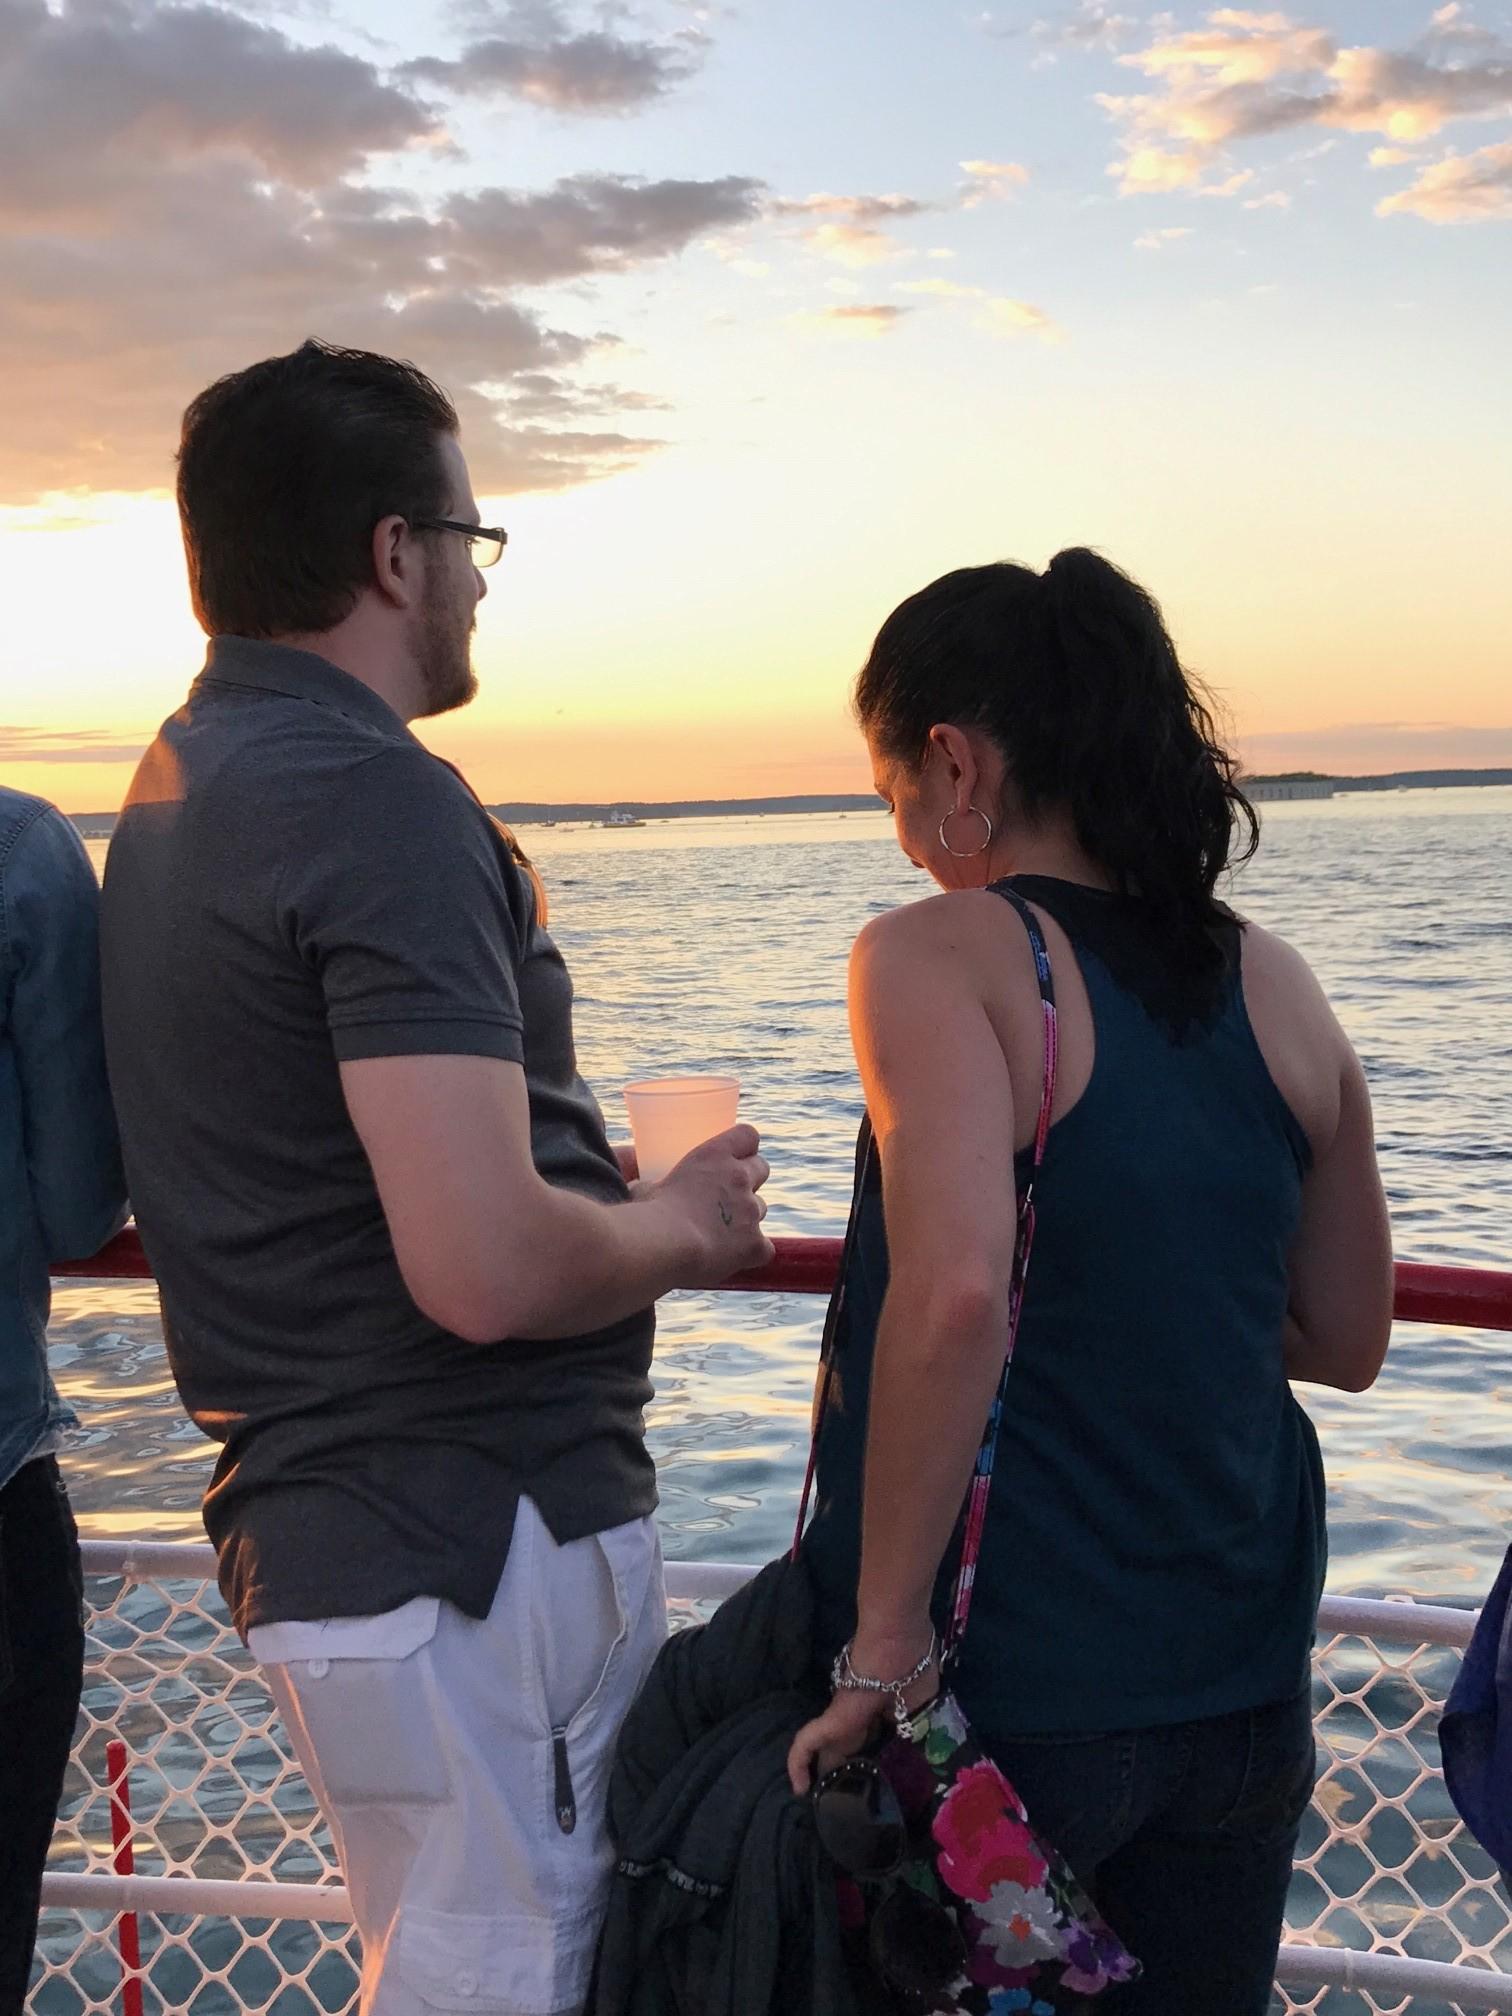 Guests enjoy Sunset - Pam Harvey photo.jpg